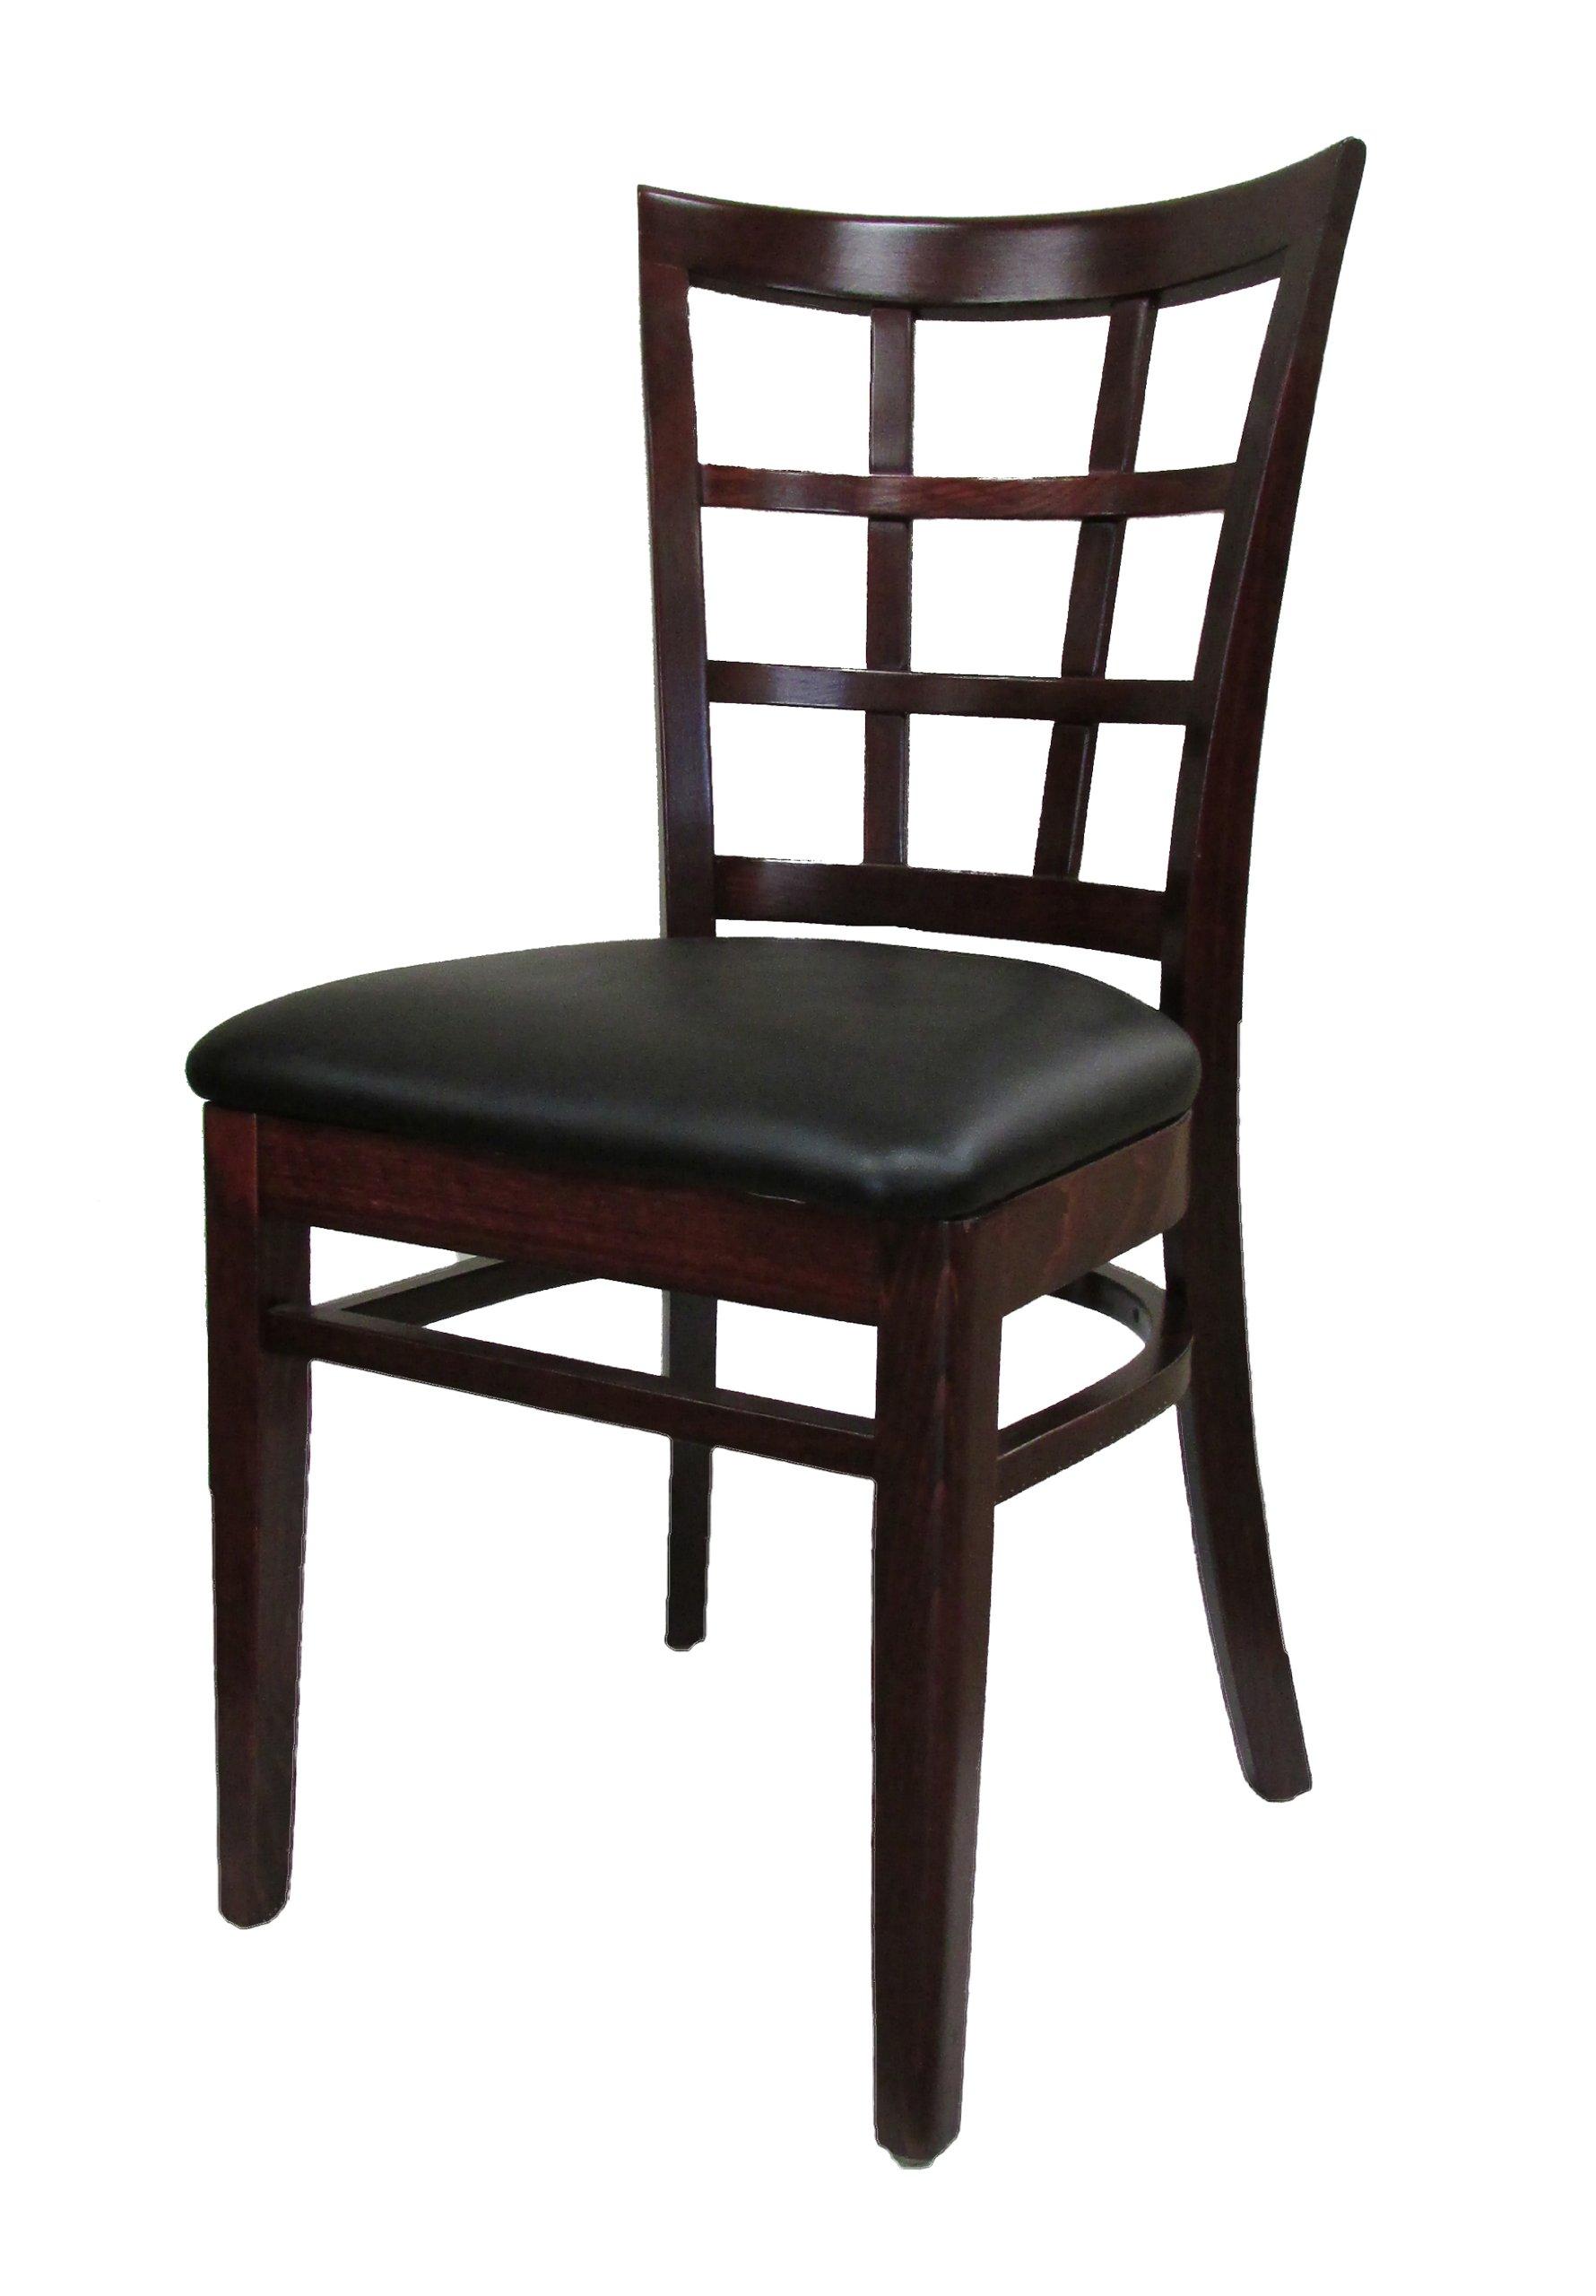 Oak Street Manufacturing WC017WA-BLK Solid Walnut Wood Frame Windowpane Dining Chair with Black Vinyl Seat, 18'' Width x 17'' Depth